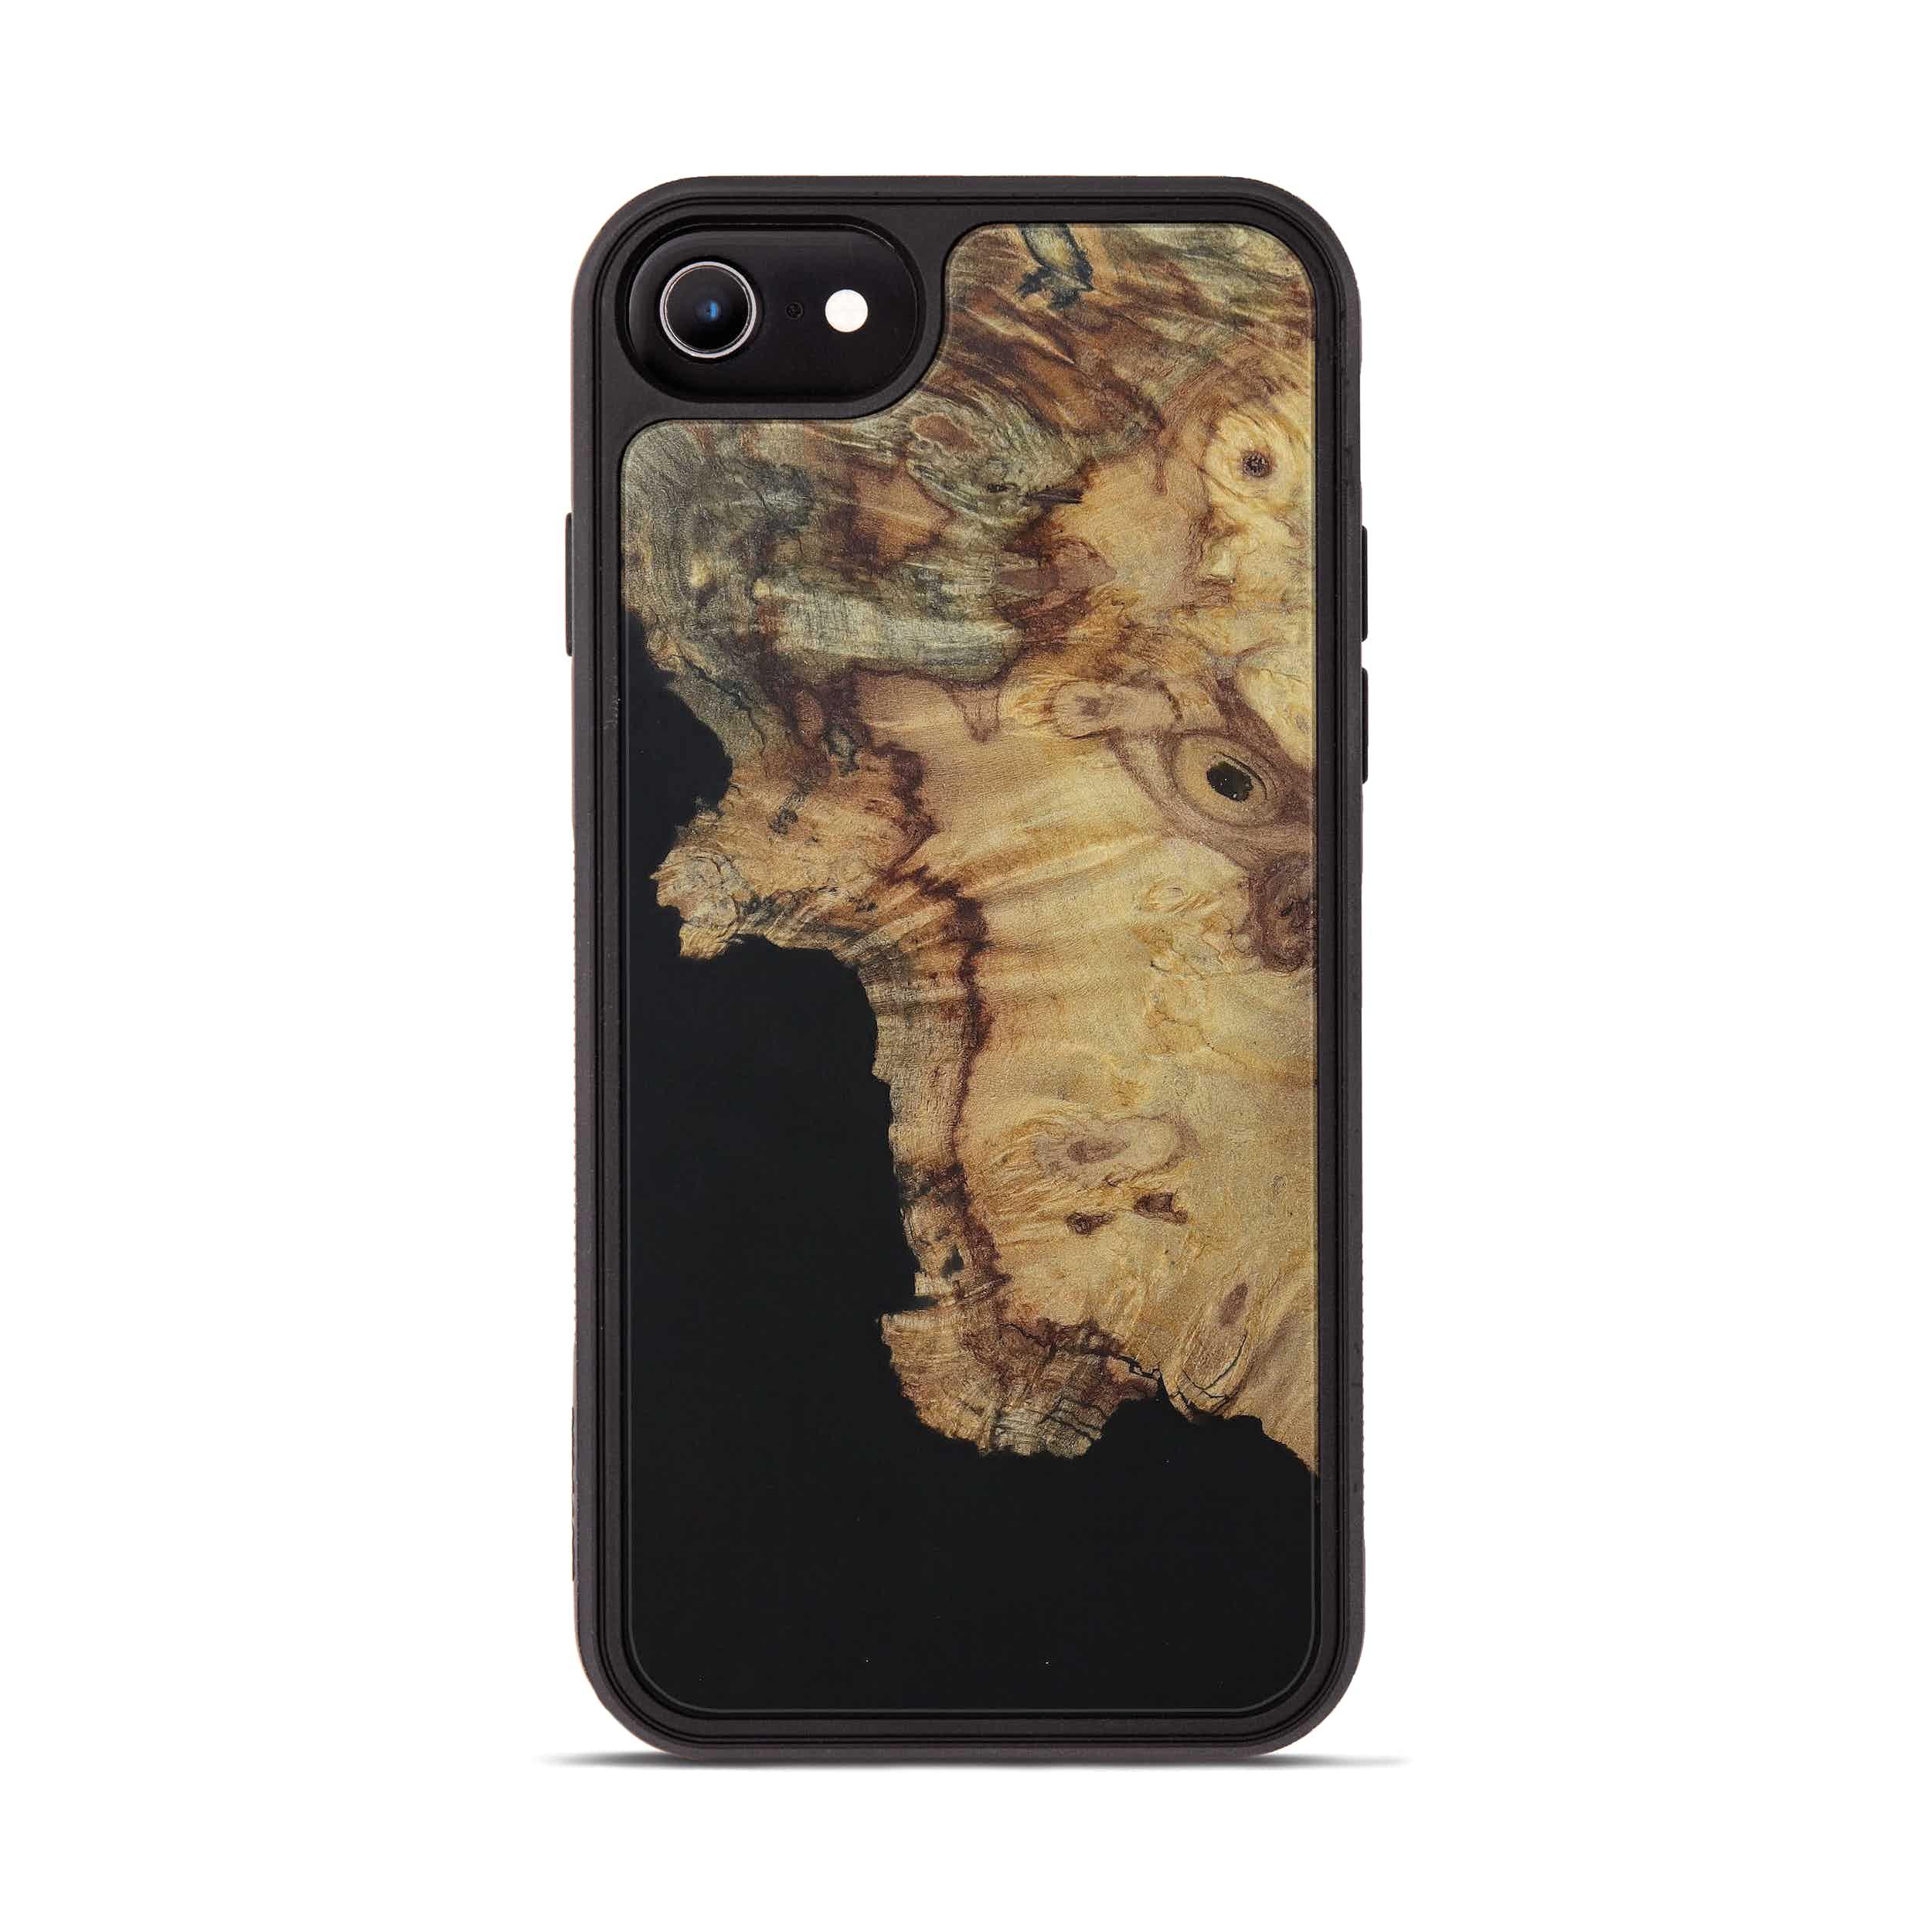 iPhone 8 Wood+Resin Phone Case - Ryann (Pure Black, 394742)